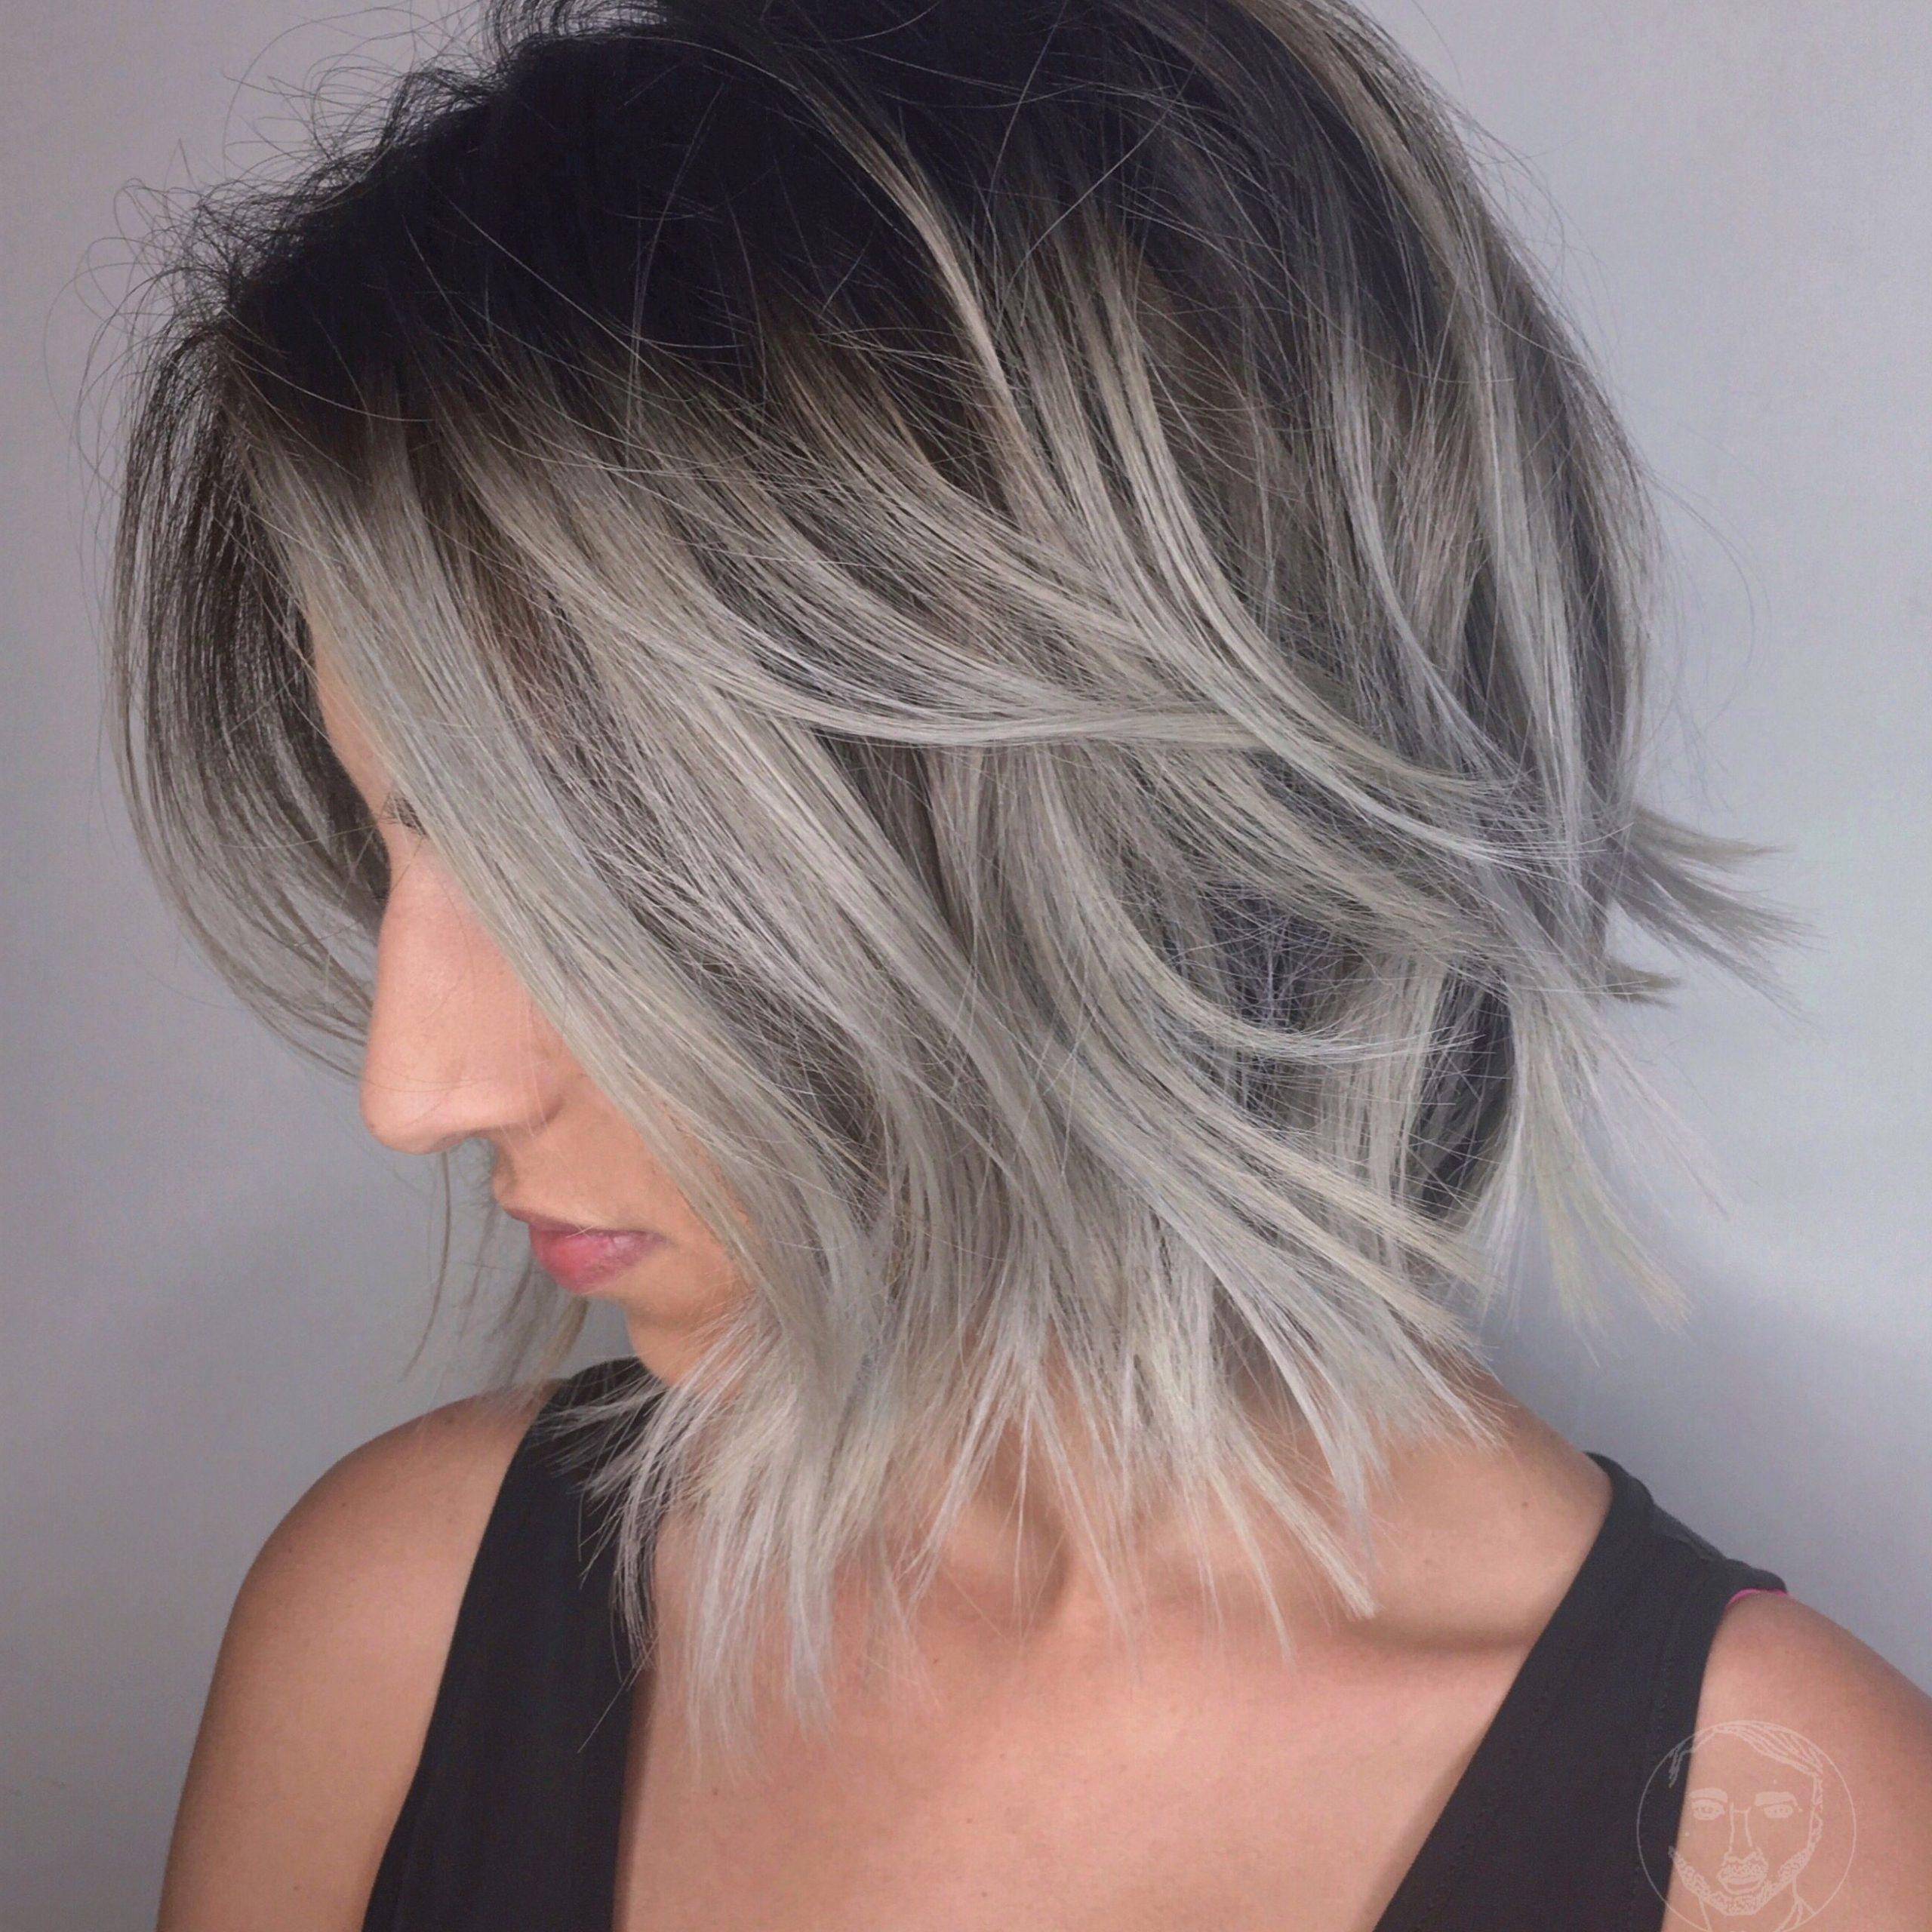 Aveda Wavy Long Blonde Bob Short Hair Beach Wave Medium Regarding Beachy Waves Hairstyles With Balayage Ombre (View 15 of 20)